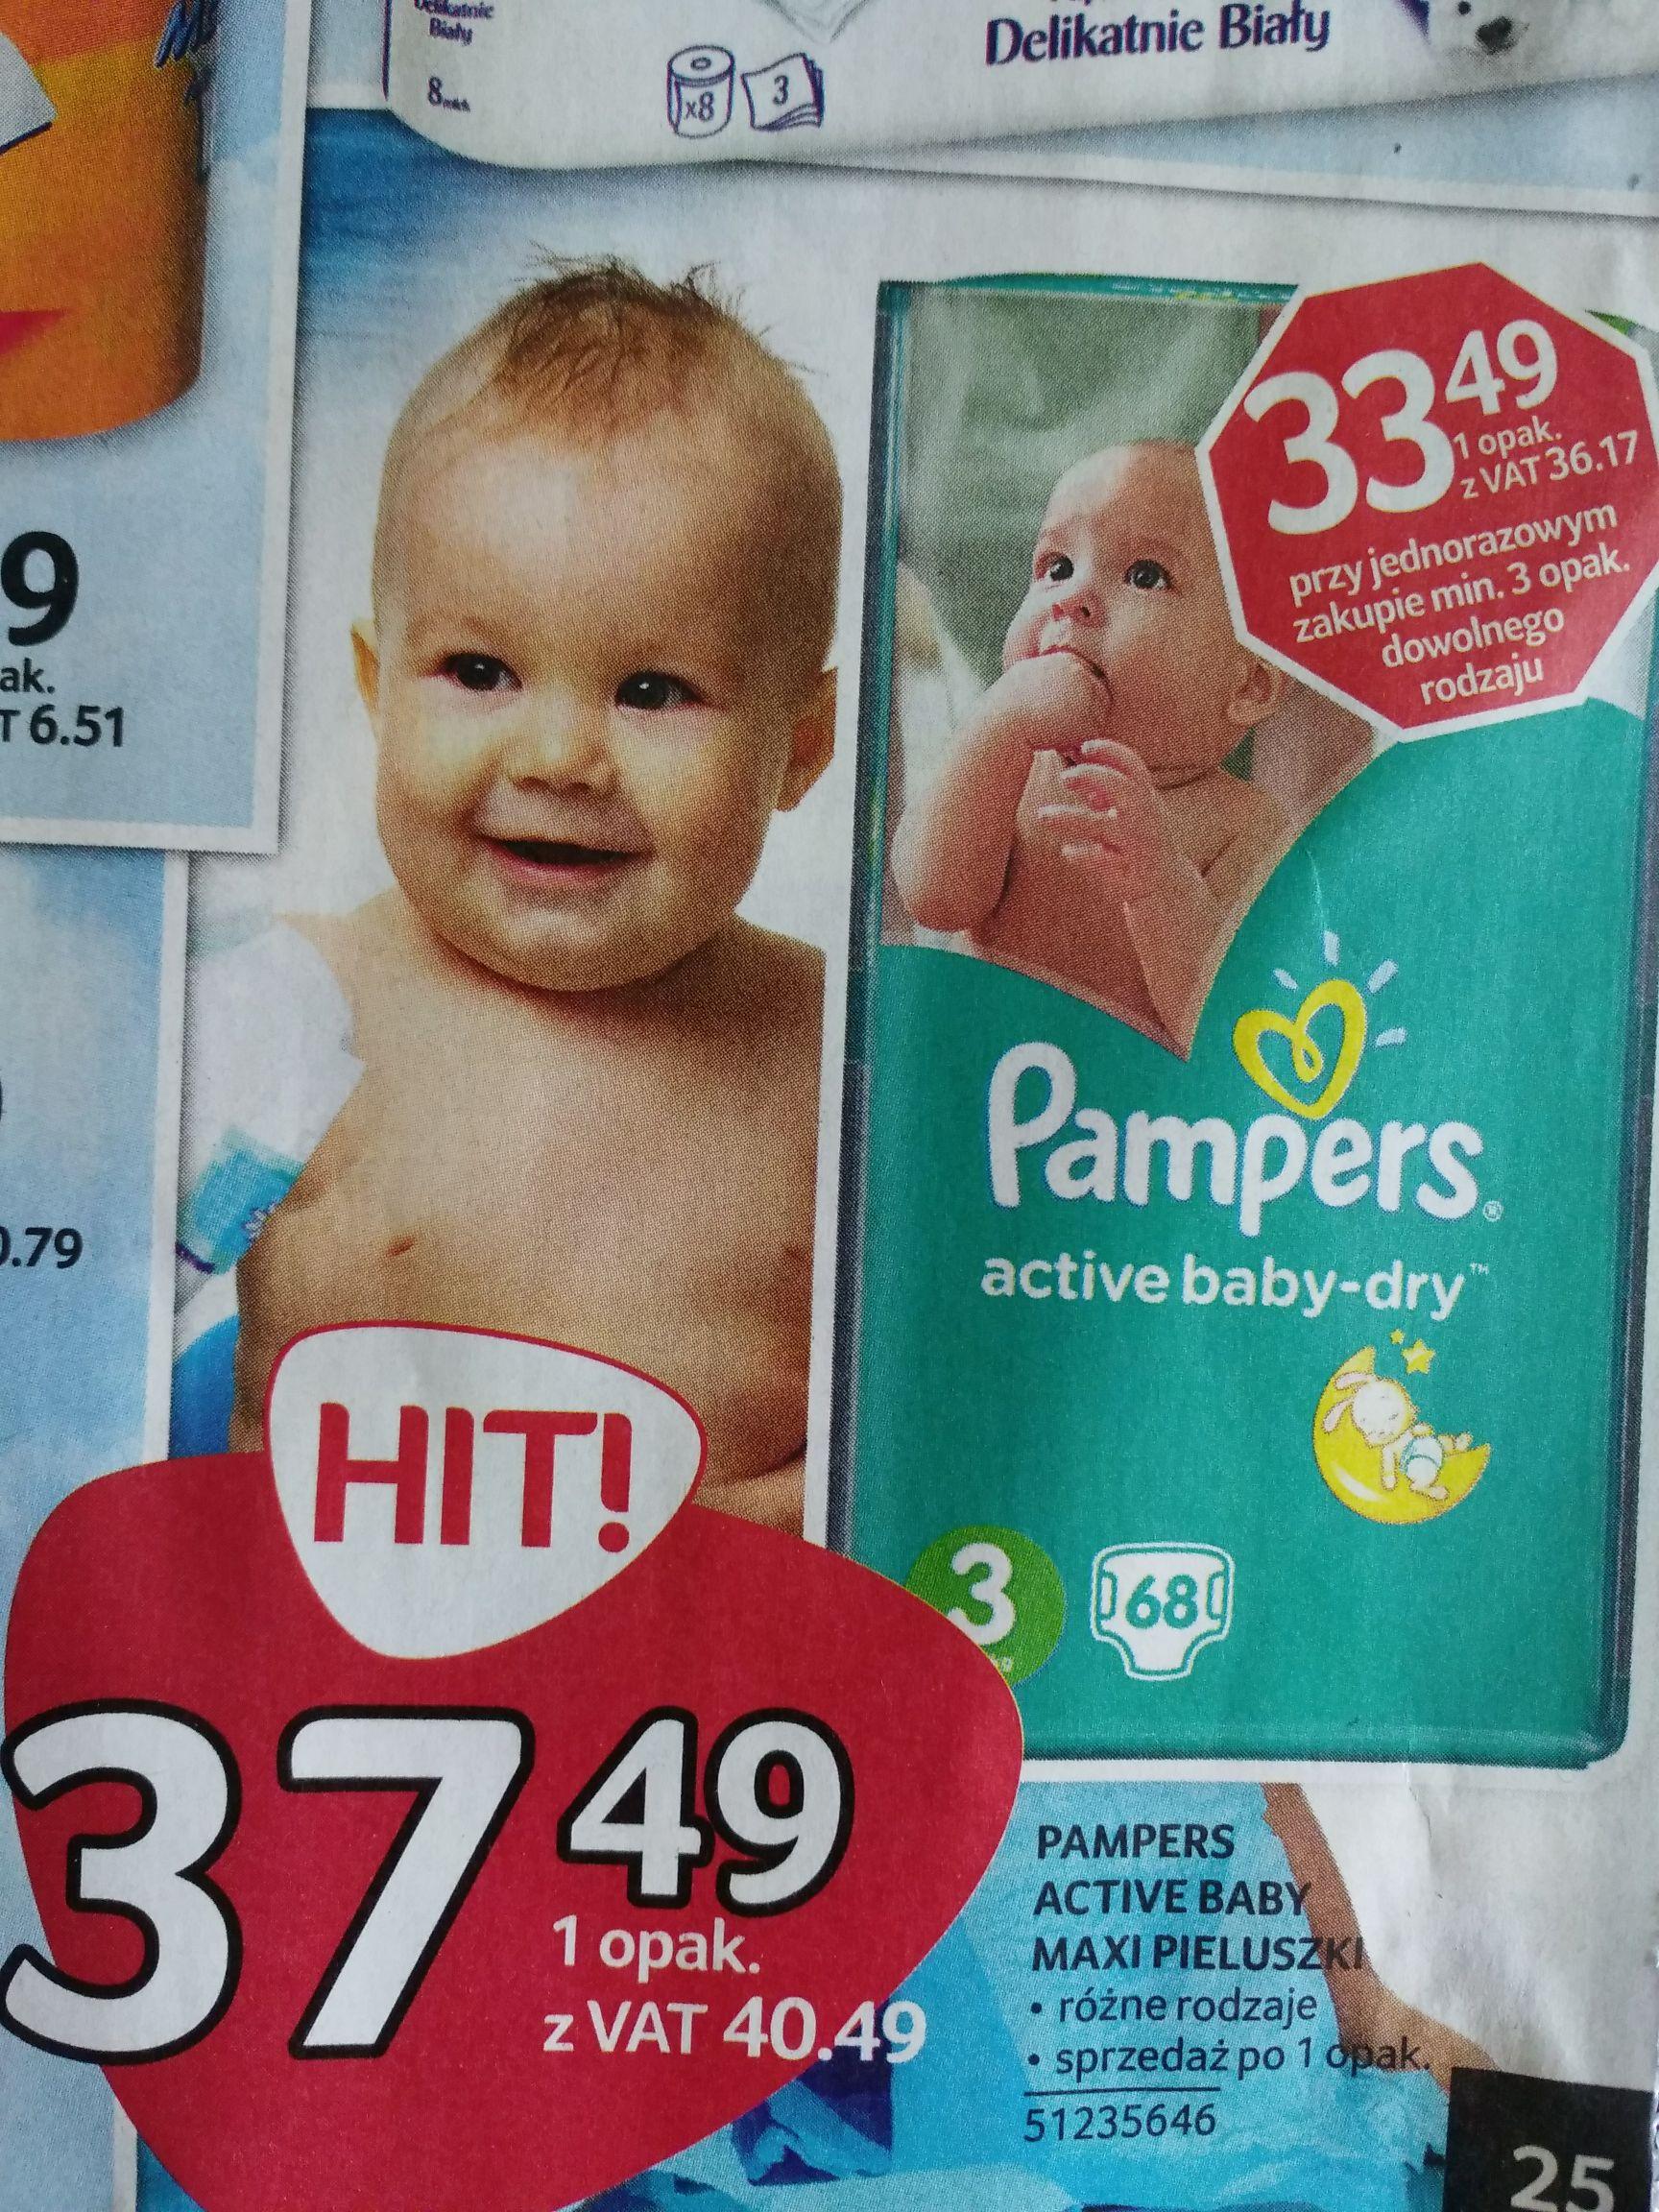 Selgros Pieluszki Pampers Active baby-dry. Chusteczki do -20%